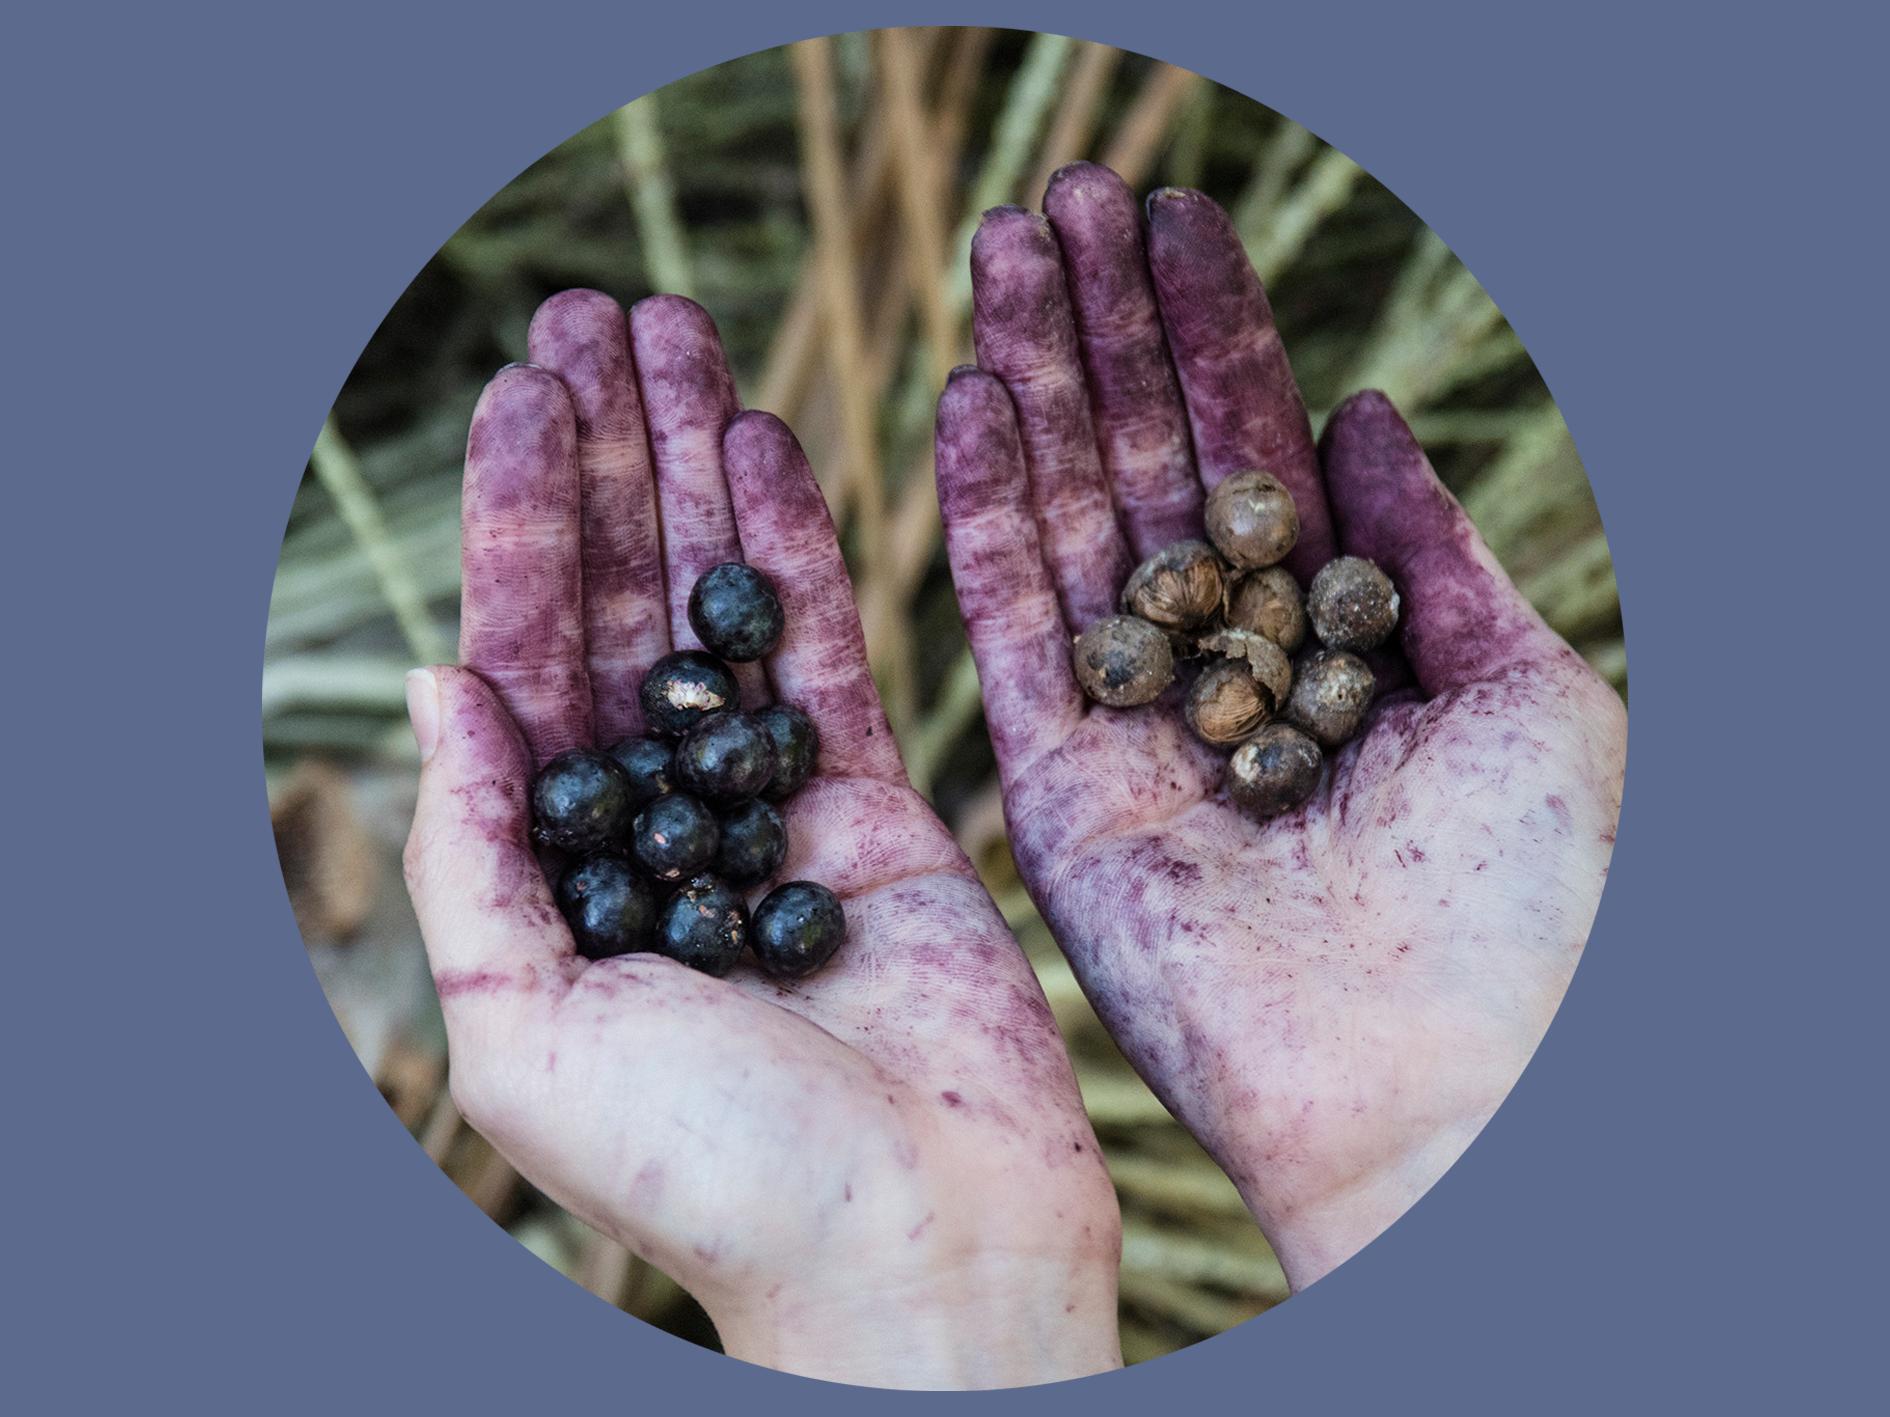 Left: Freshly picked Açaí berries    Right: Fermented Açaí berries after 3 days